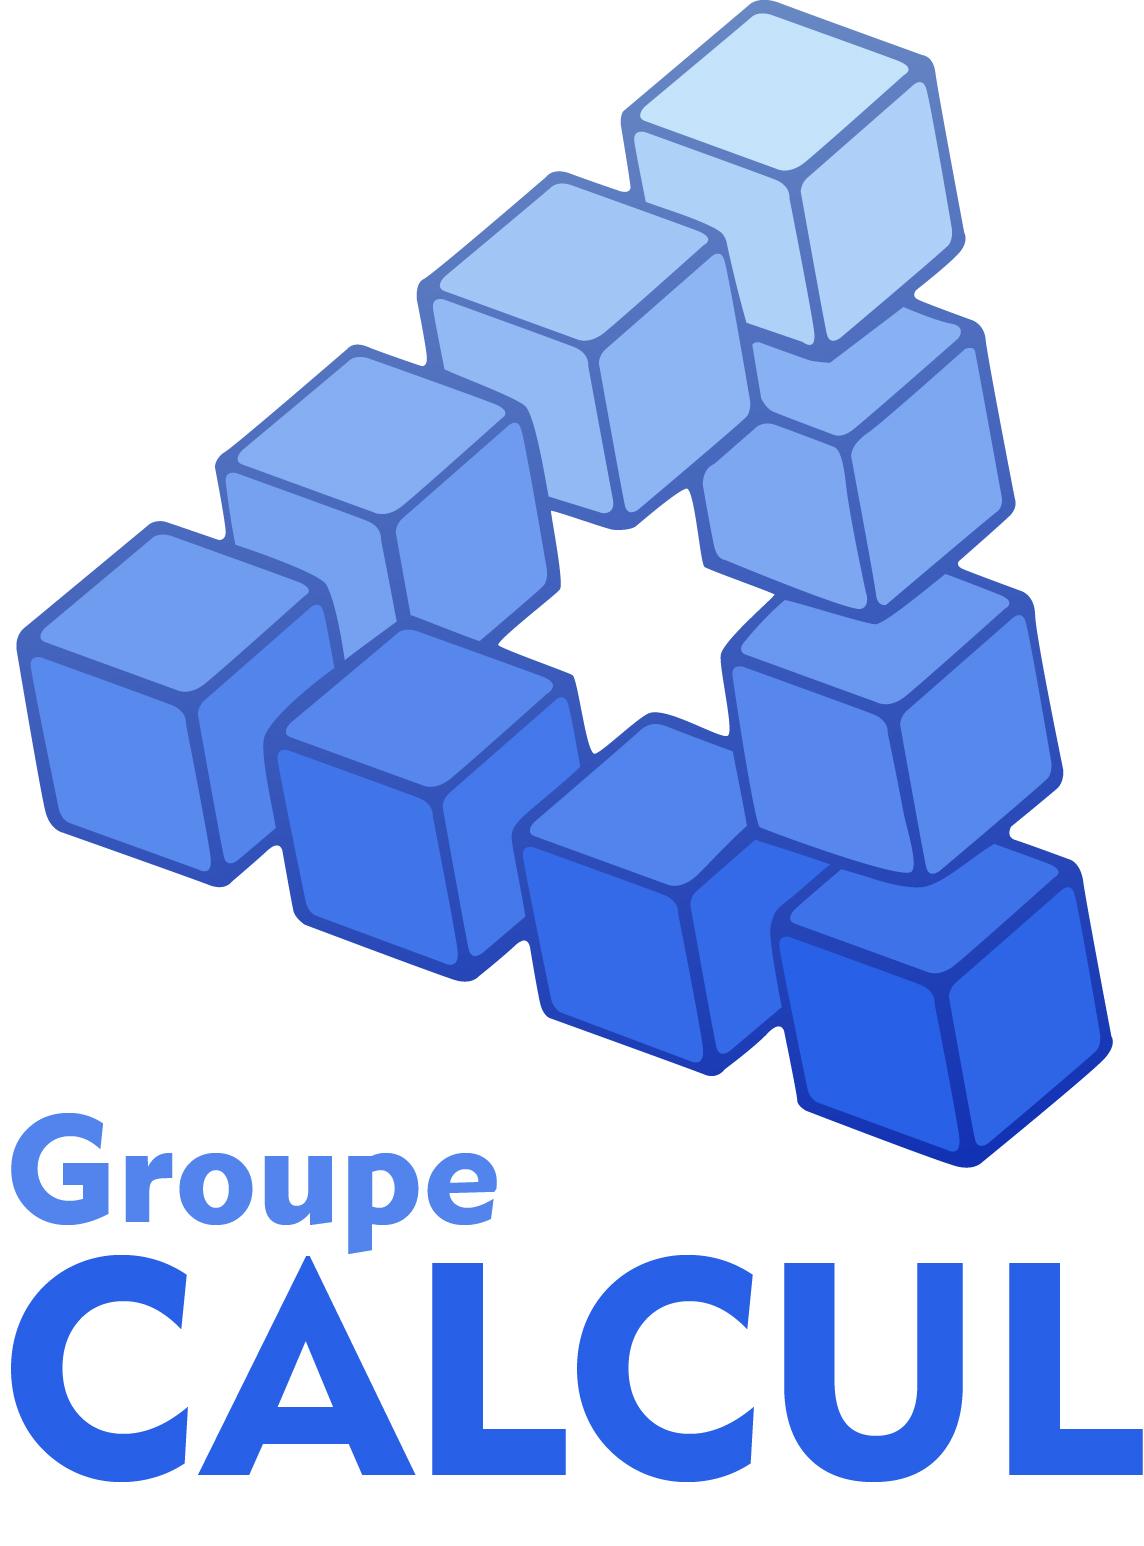 Groupe Calcul